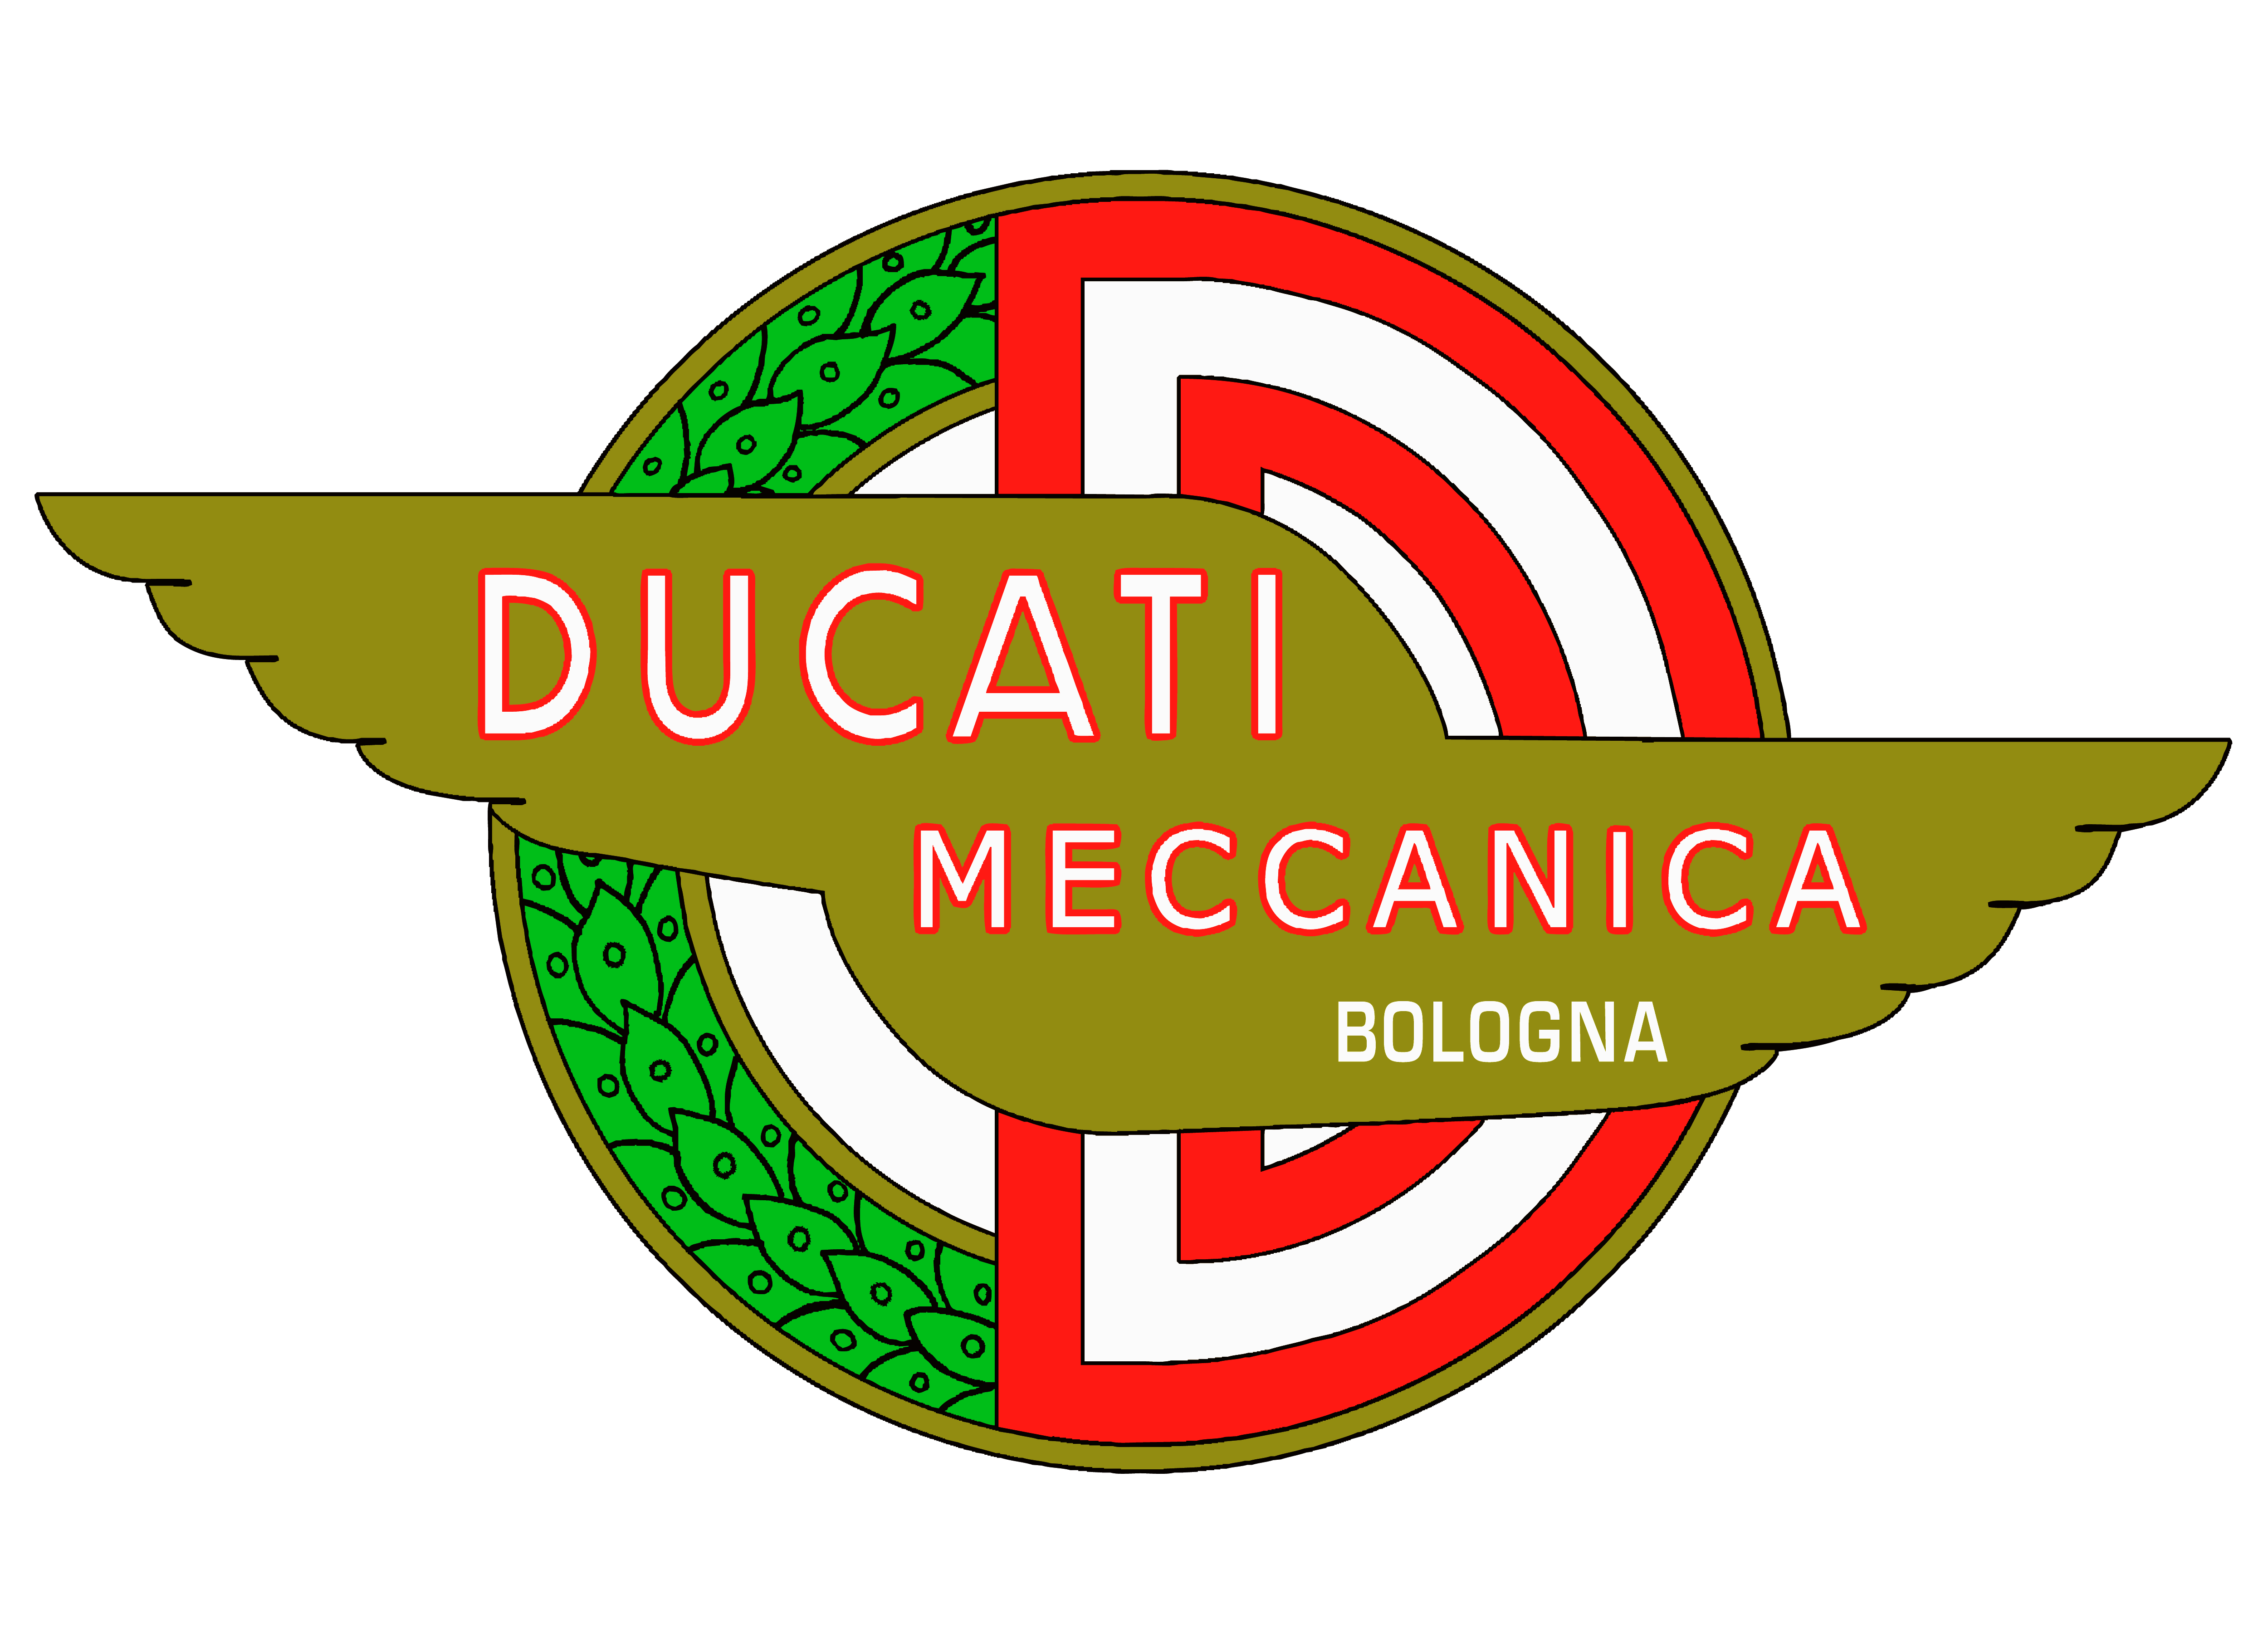 Logo Ducati Mechanica Bologna Motorcycle Logos Pinterest - Ducati motorcycles stickers